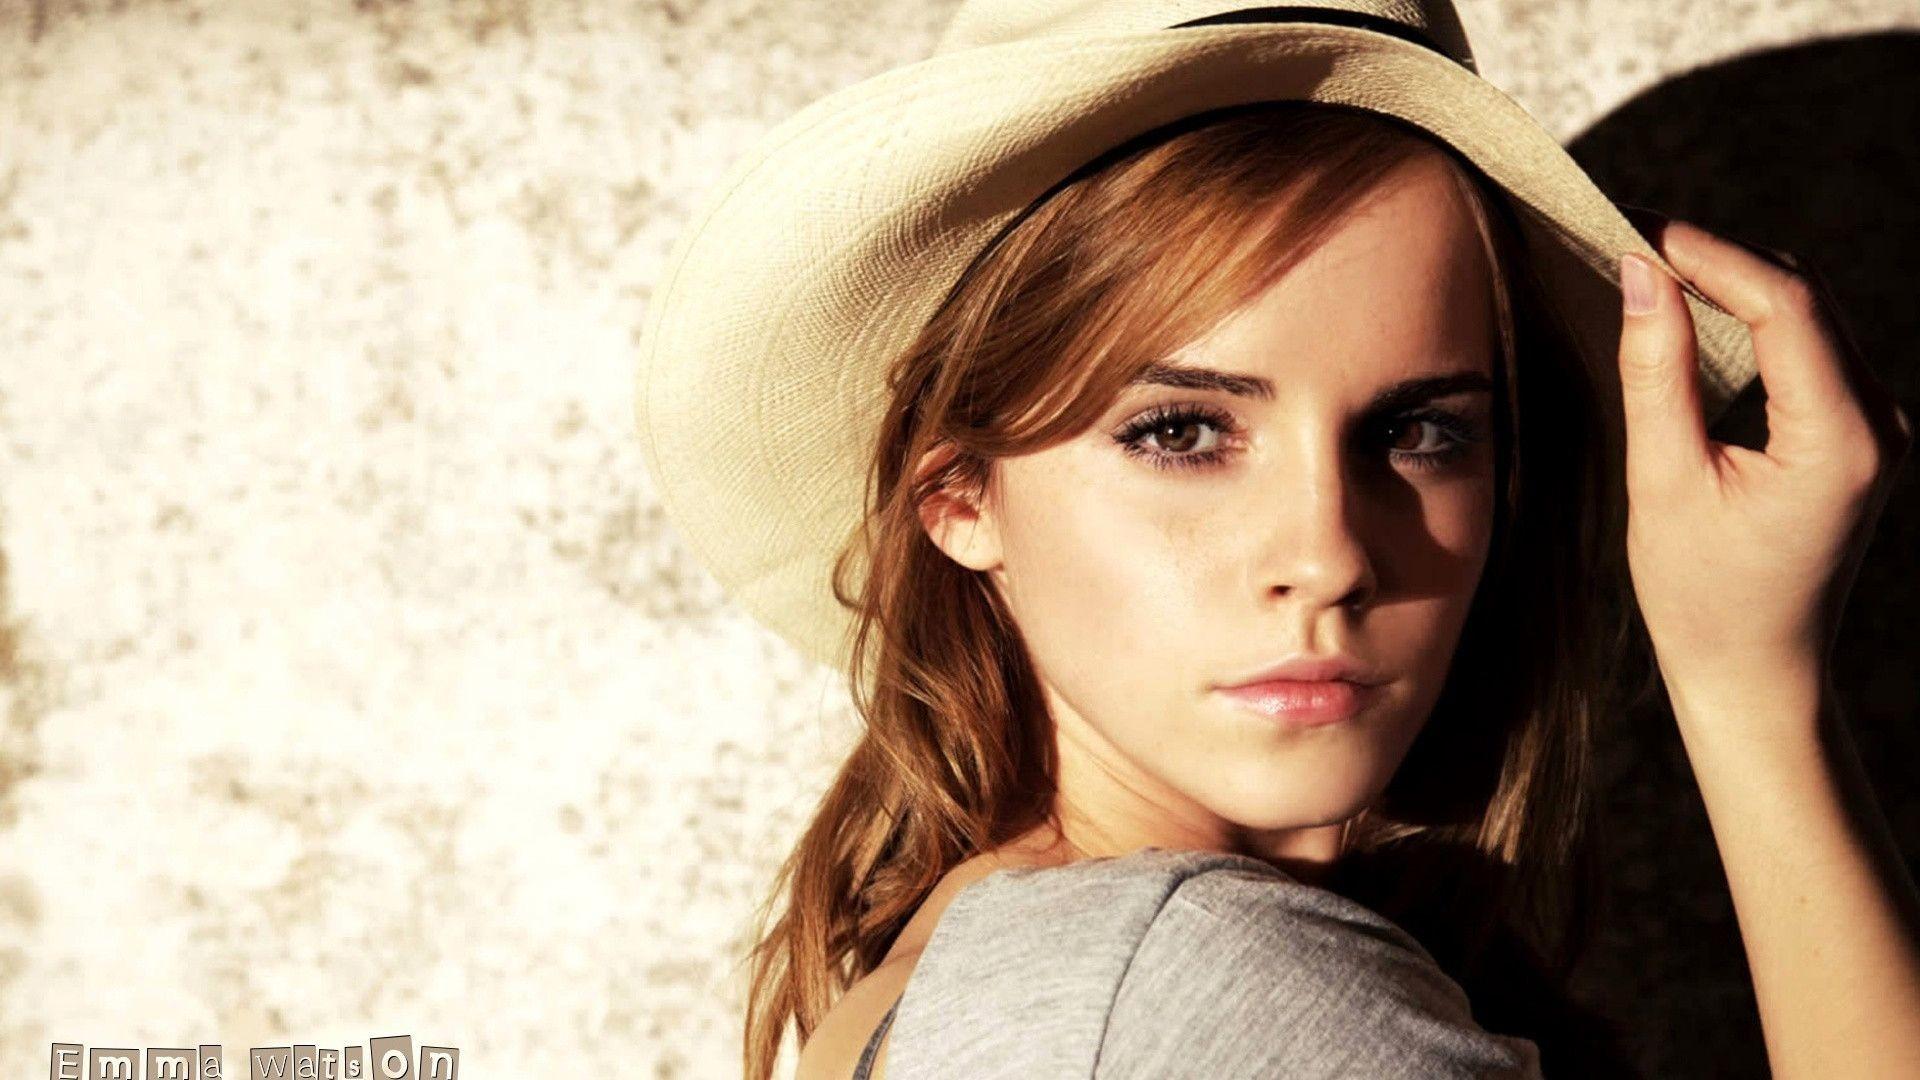 Emma Watson wallpaper high quality and definition 1920×1080 Emma Watson  Pics Wallpapers (58